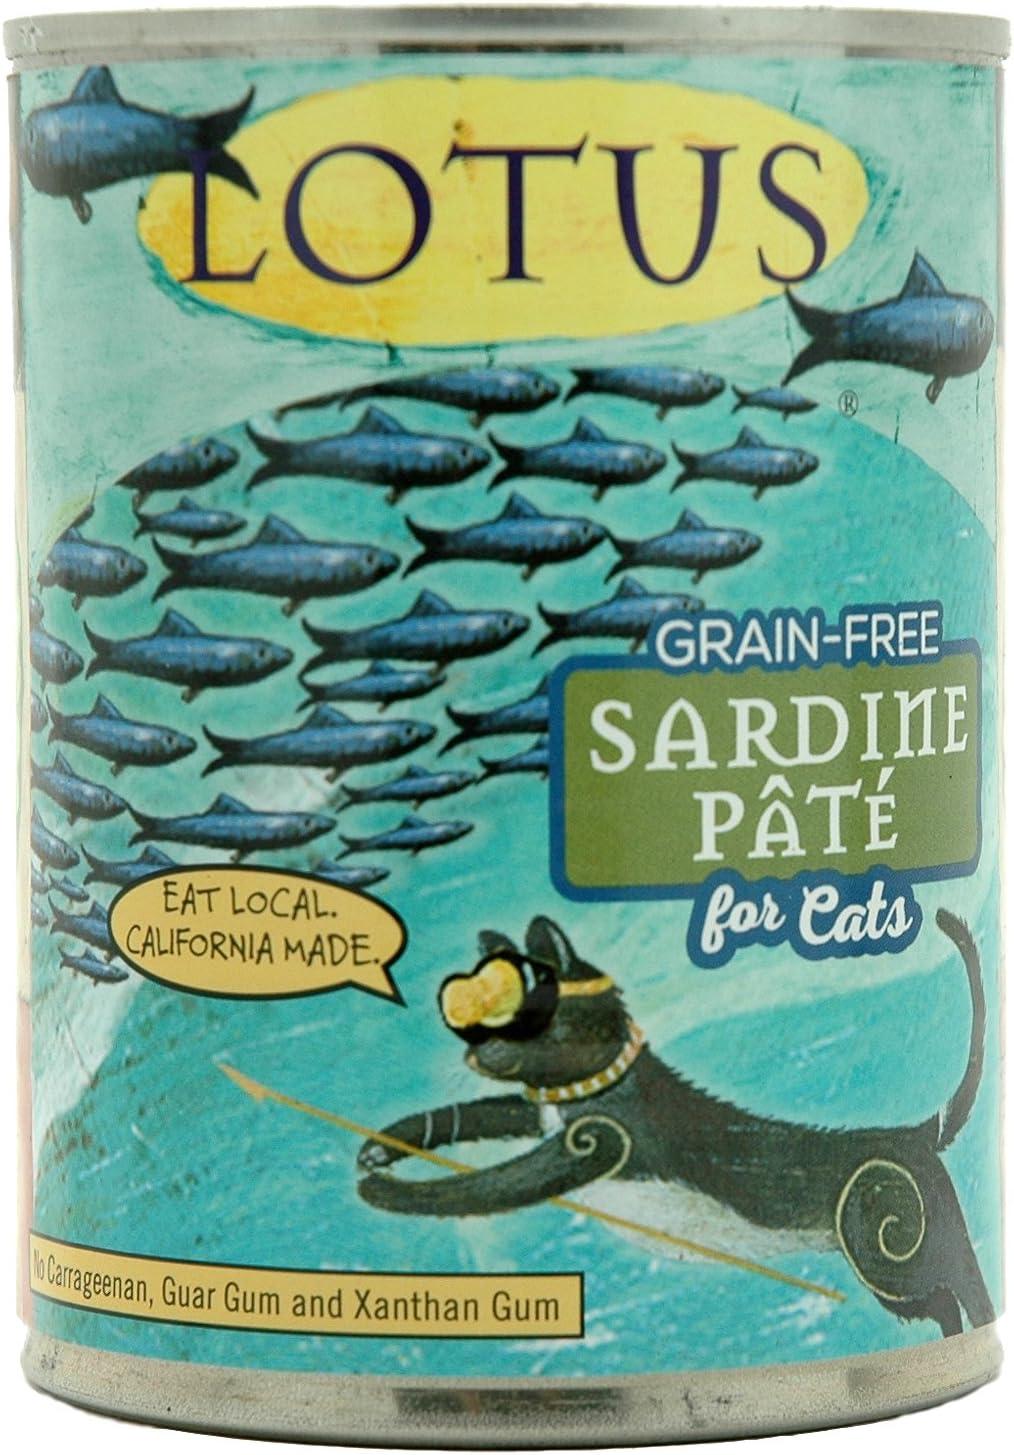 Lotus Grain Free Sardine Pate Cat Food 12.5 Ounces, case of 12